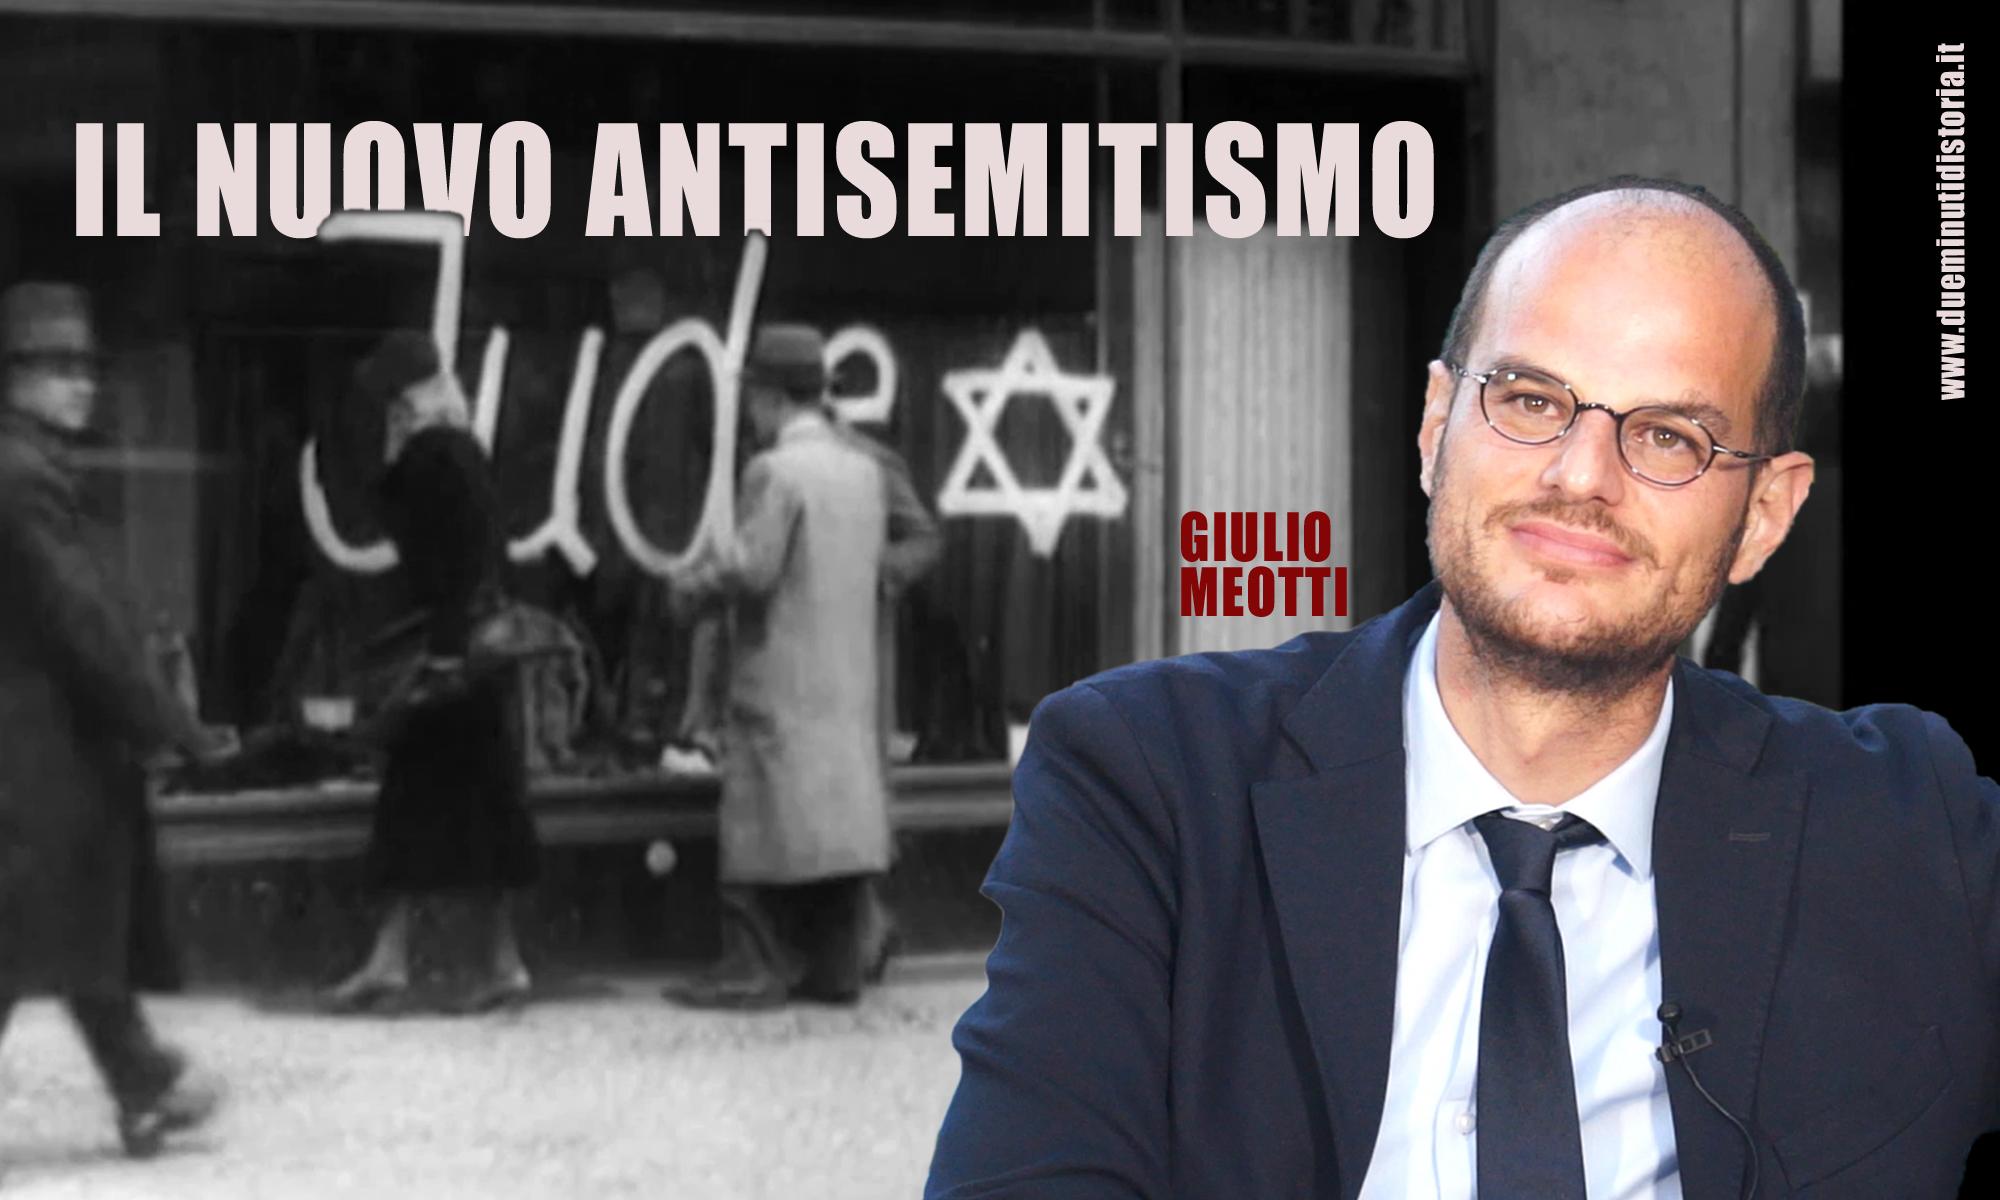 Il nuovo antisemitismo